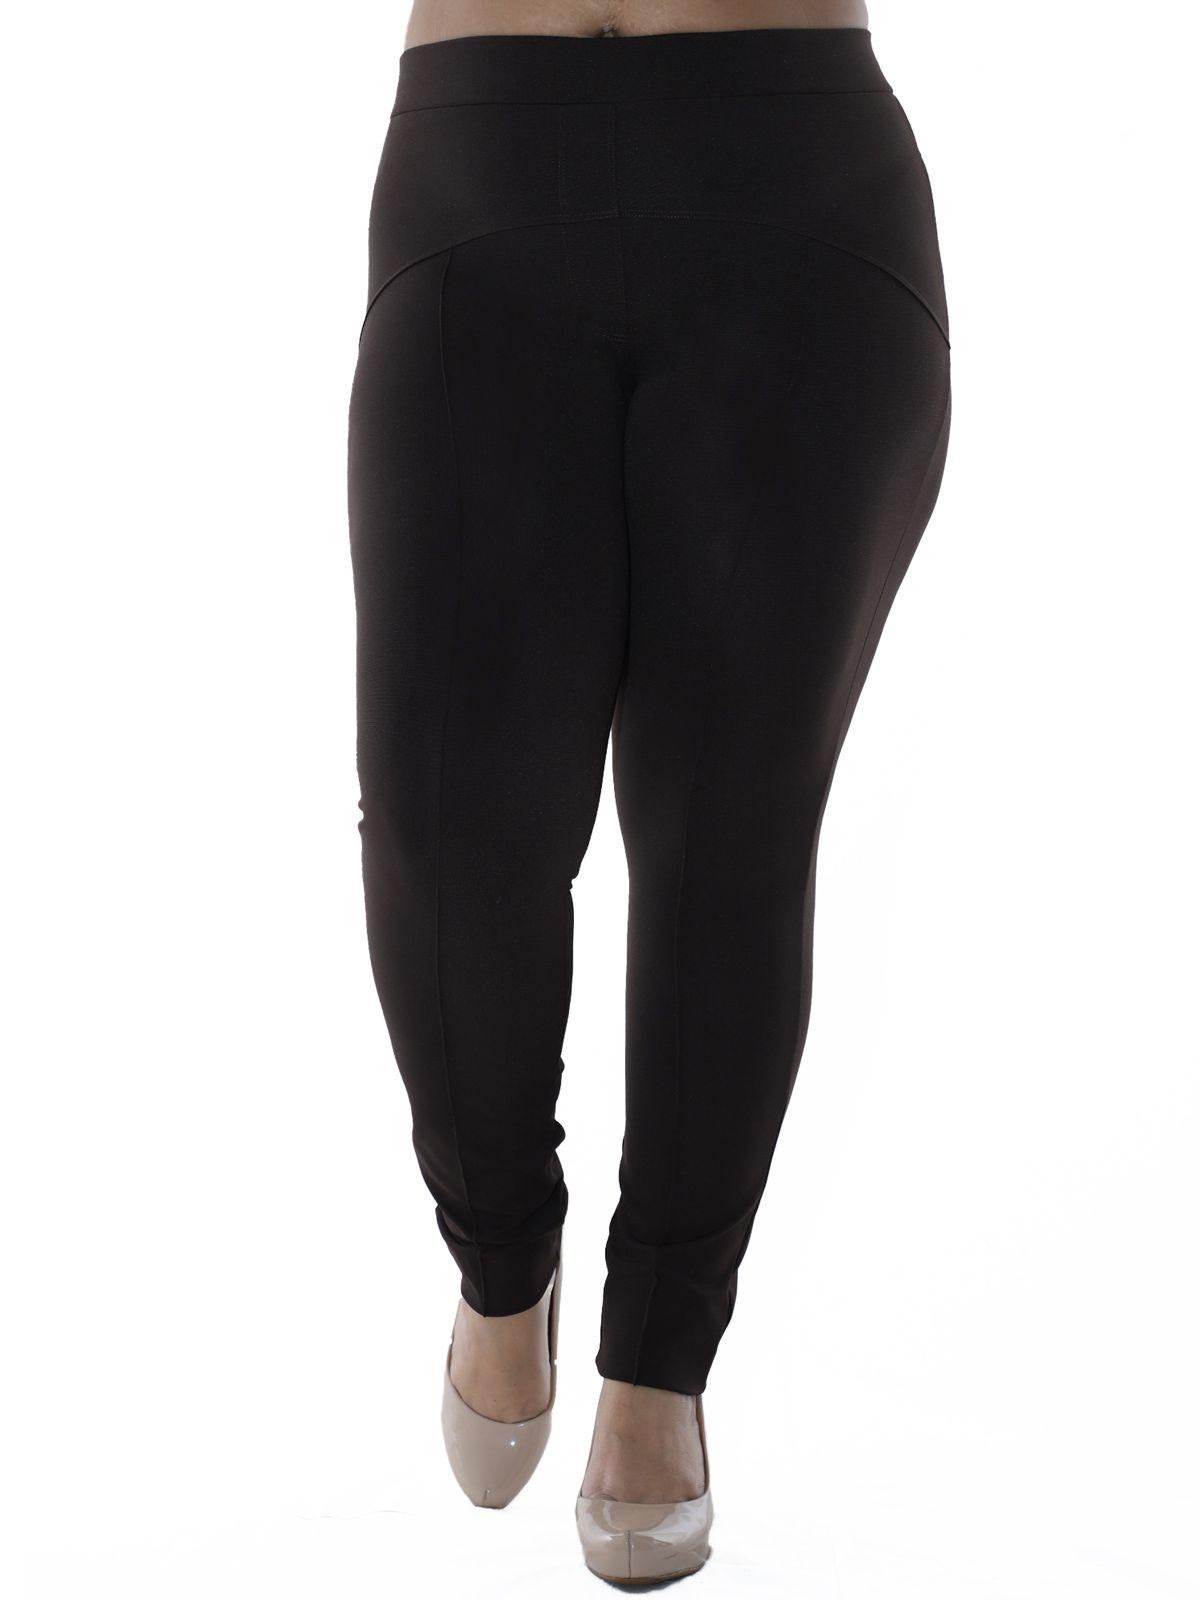 Calça Plus Size Body Fit com Recortes KTS Marrom